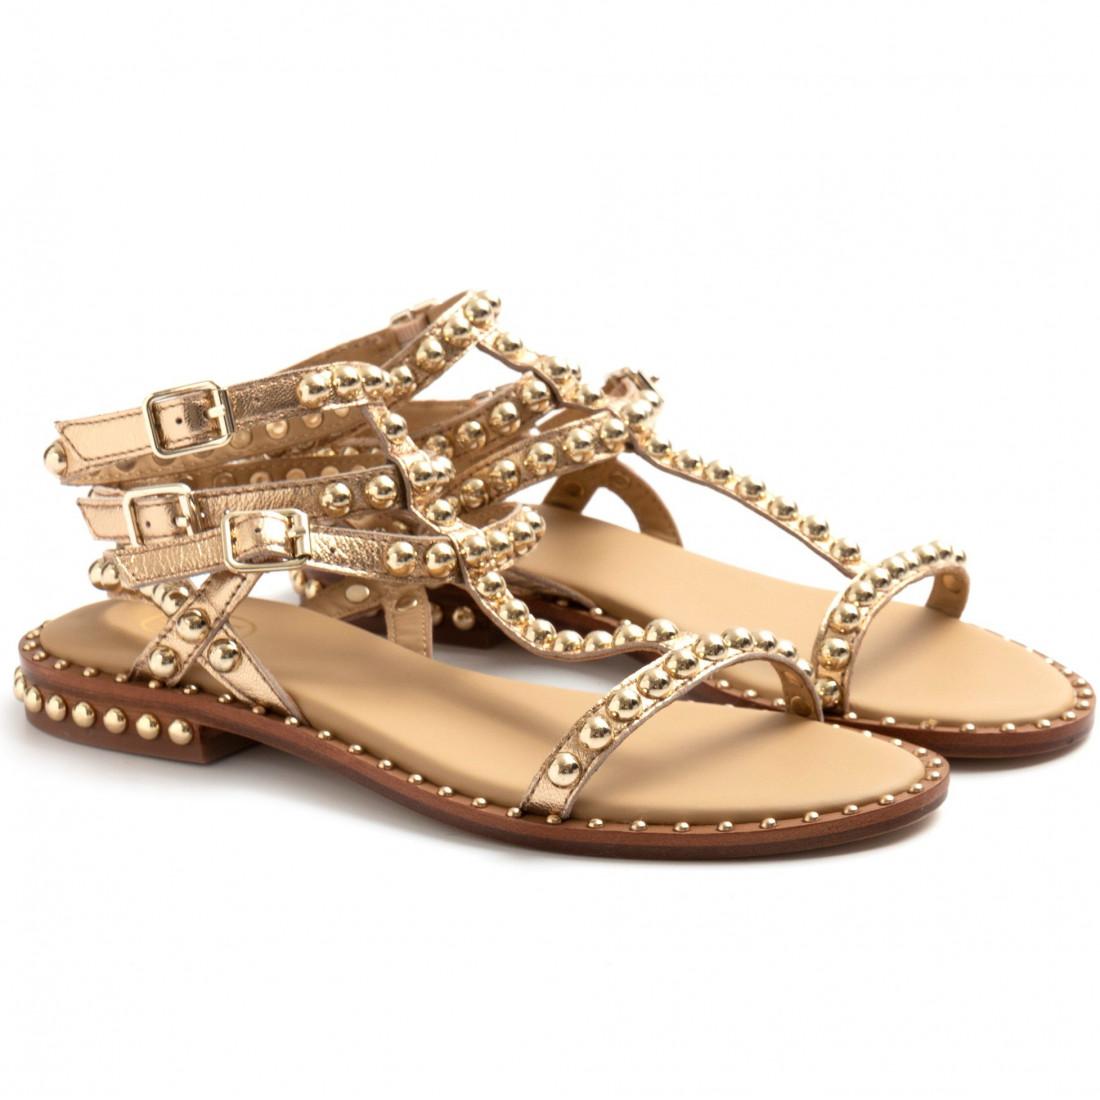 sandals woman ash play02 8697